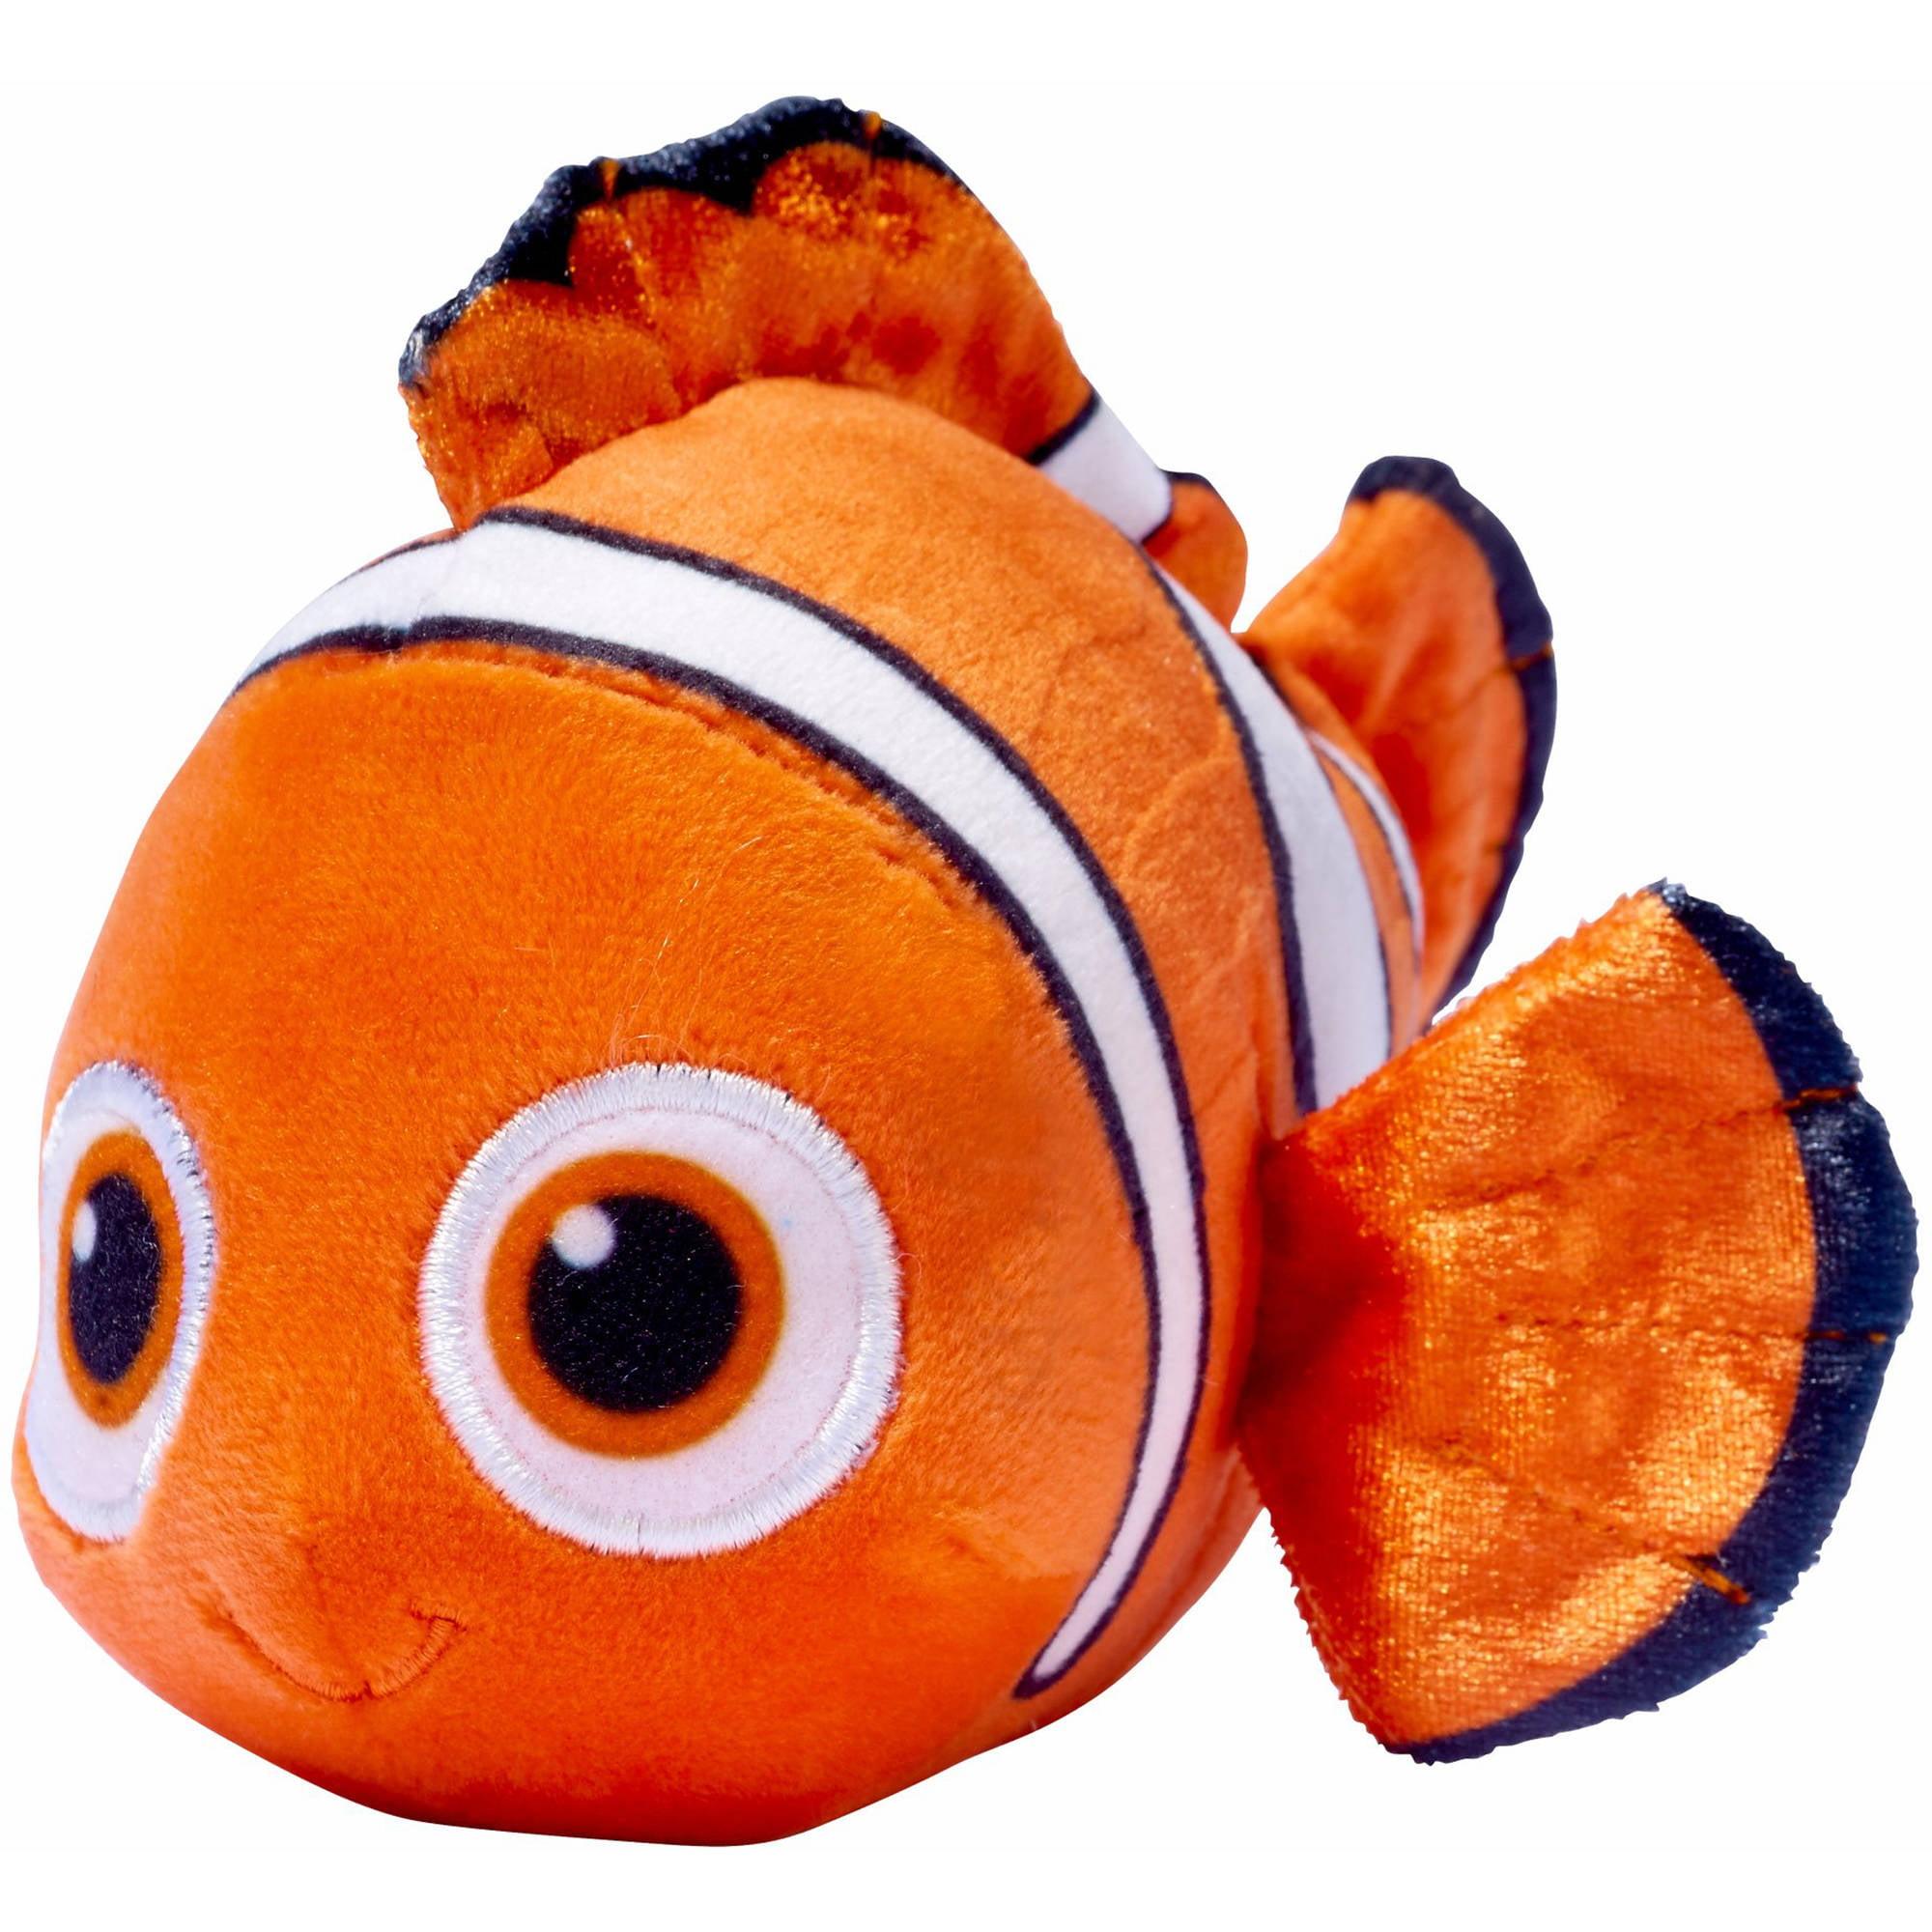 "Finding Dory 6"" Mini Plush, Nemo"